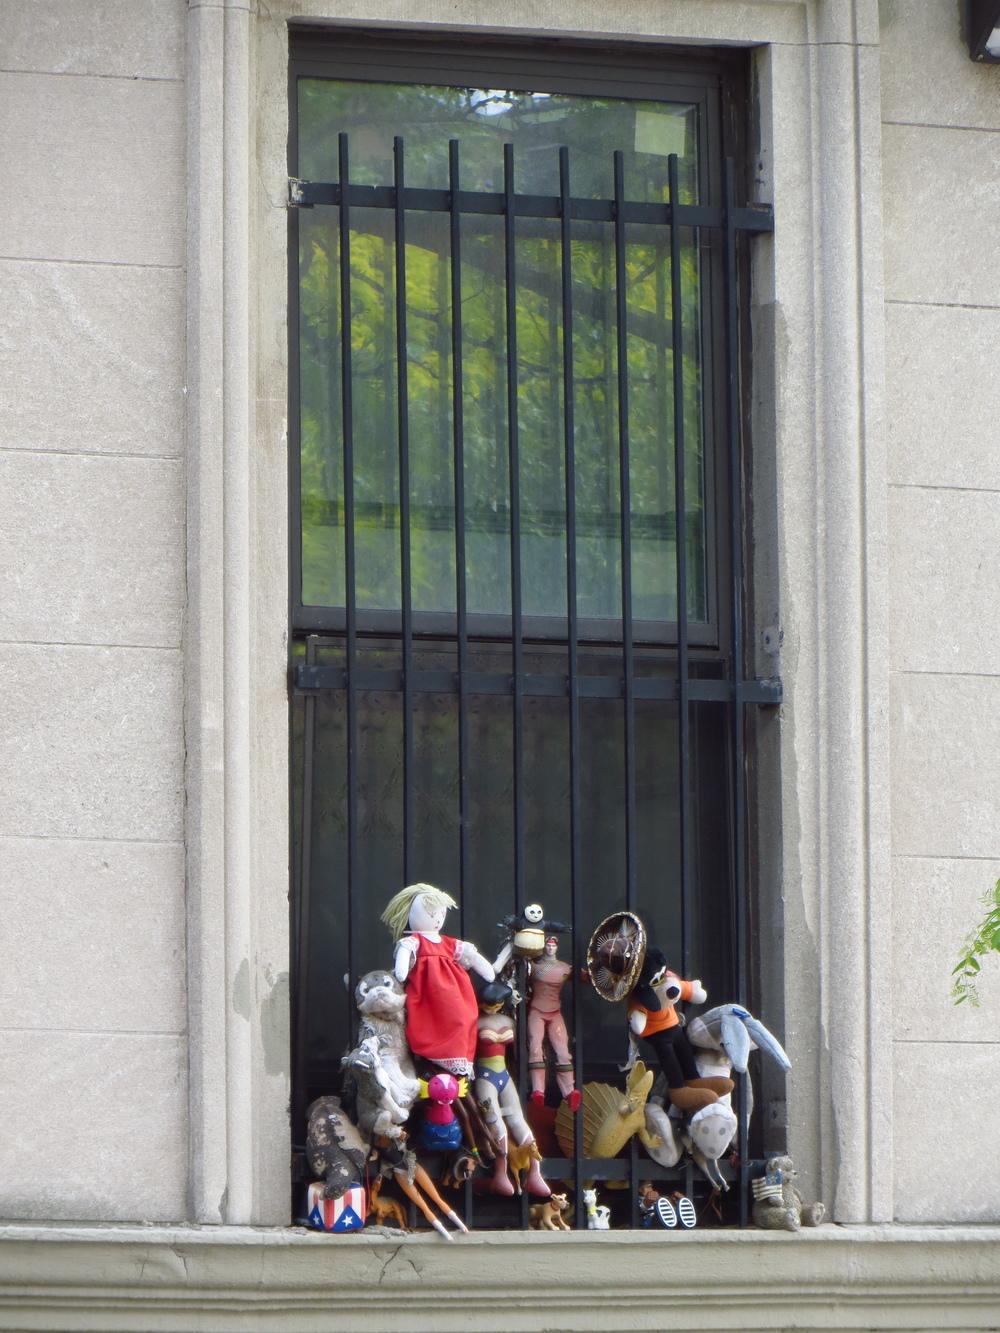 Toys in window